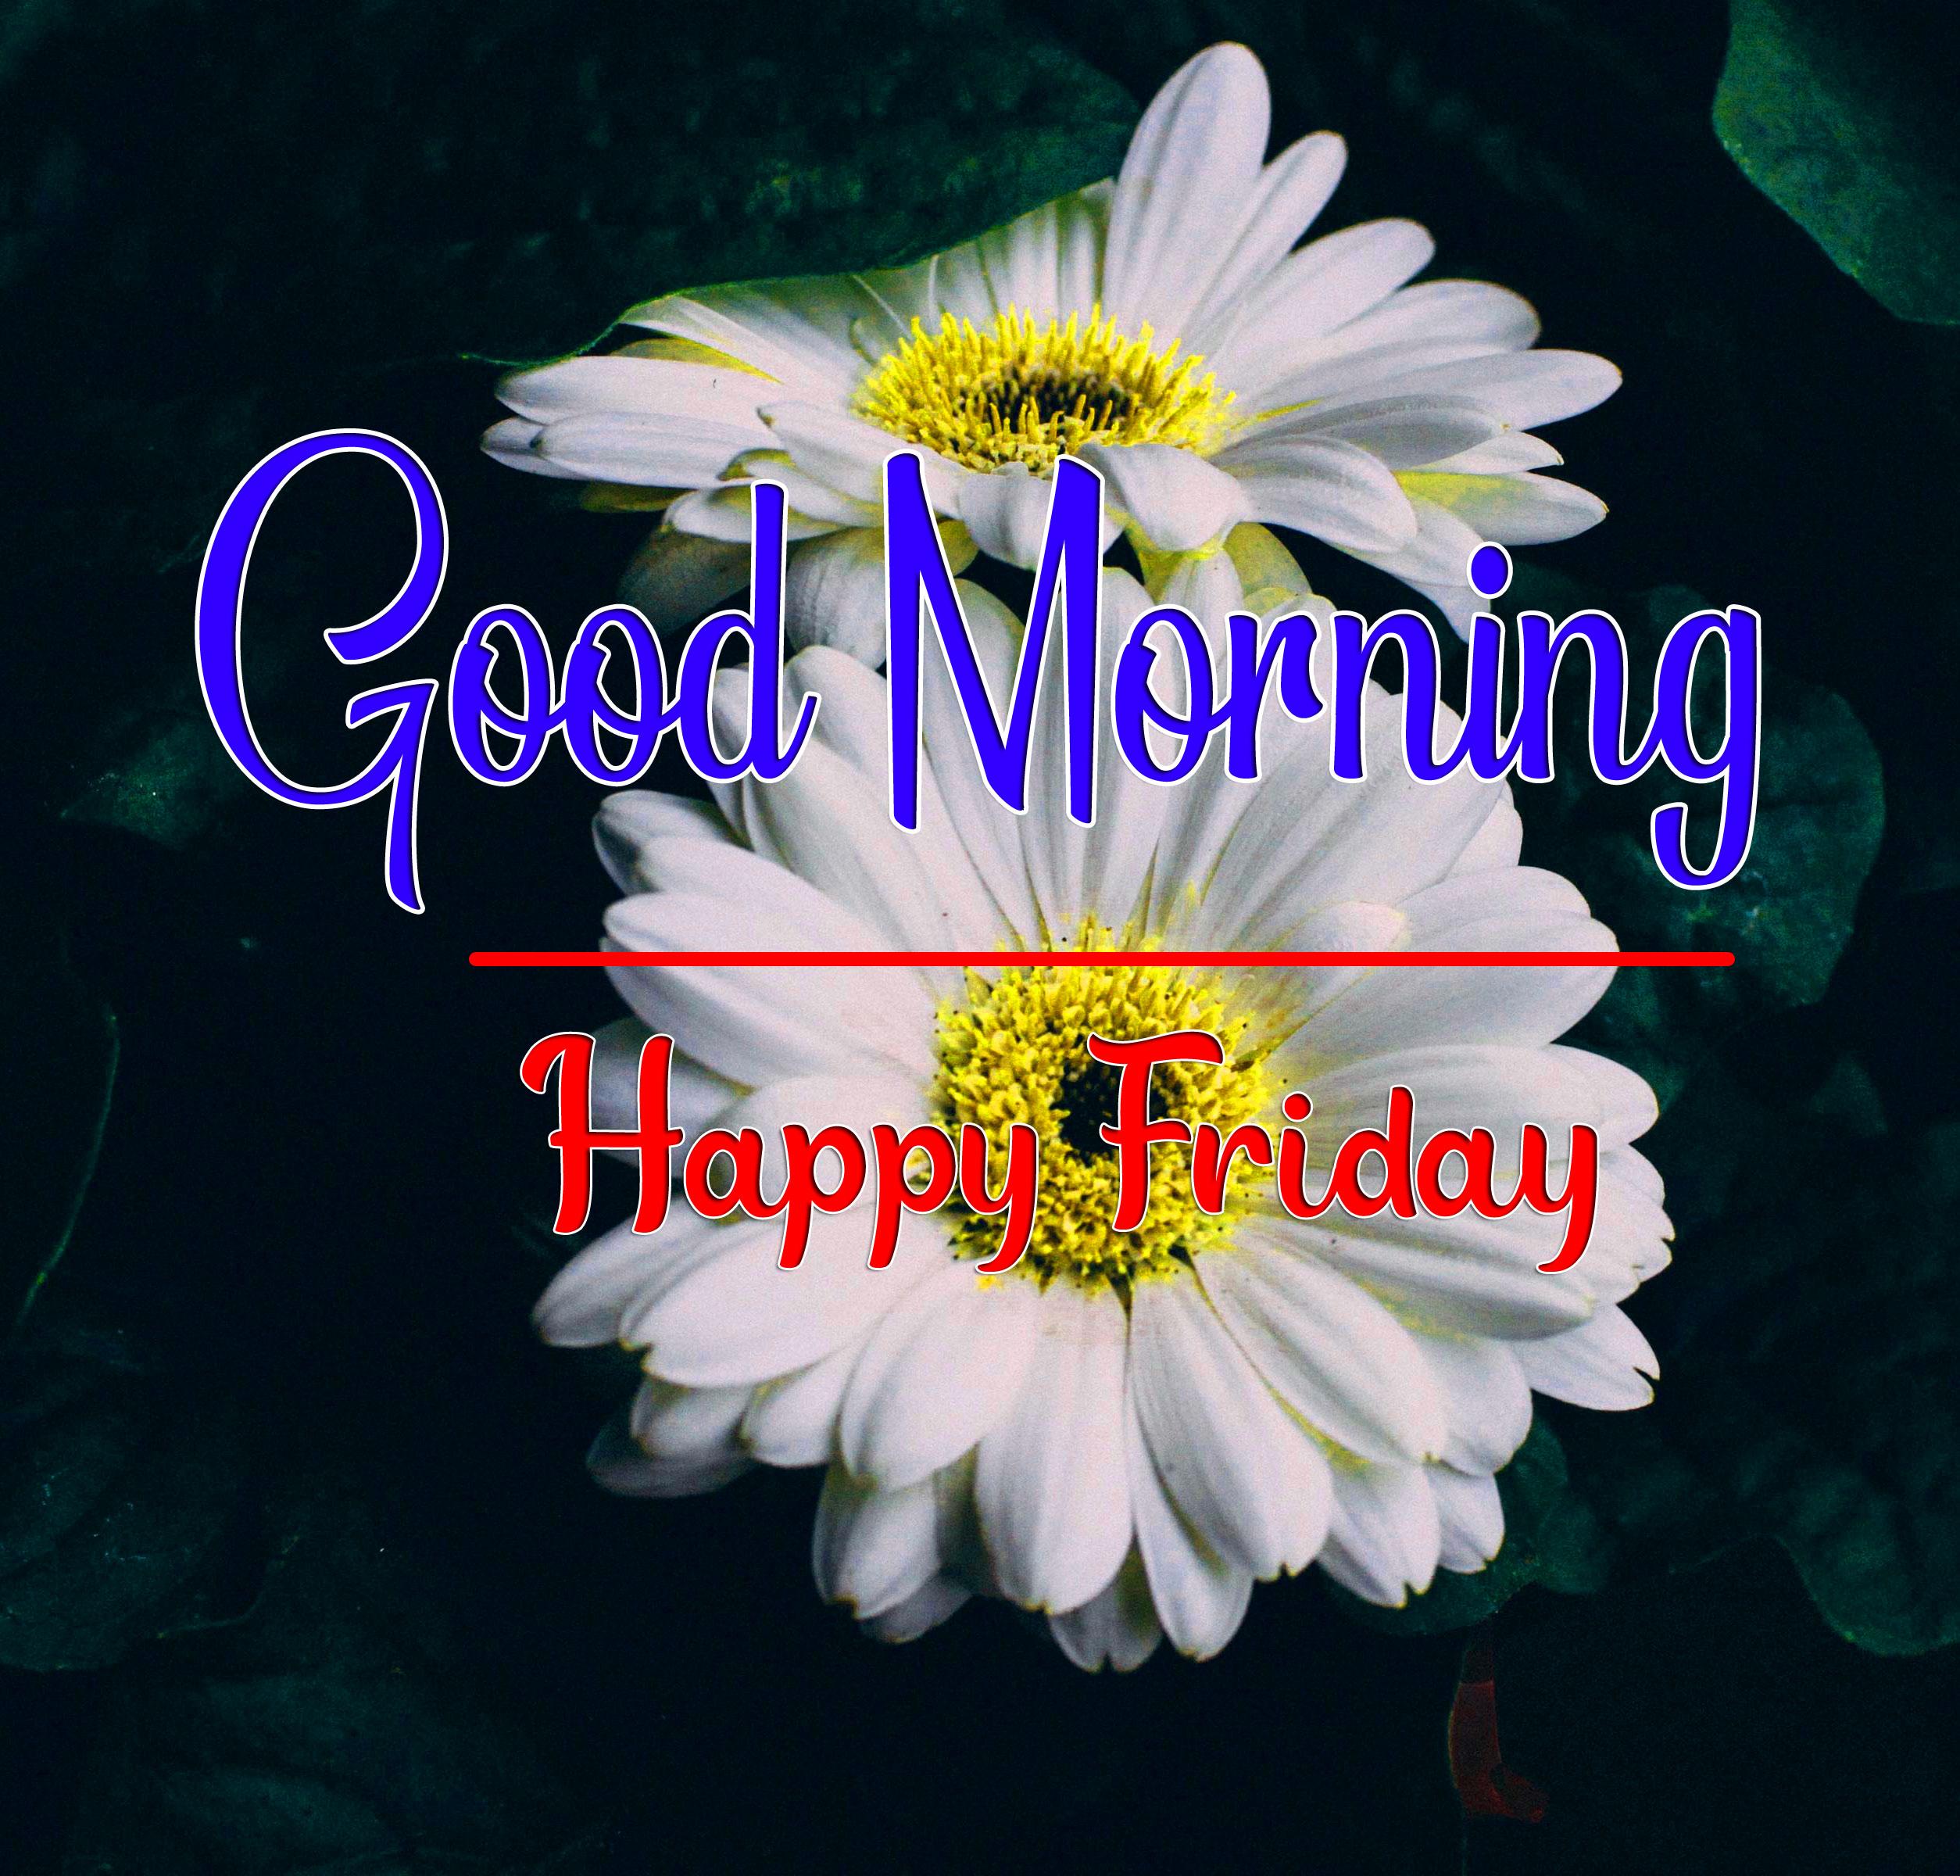 friday Good morning Wishes Pics Downlload